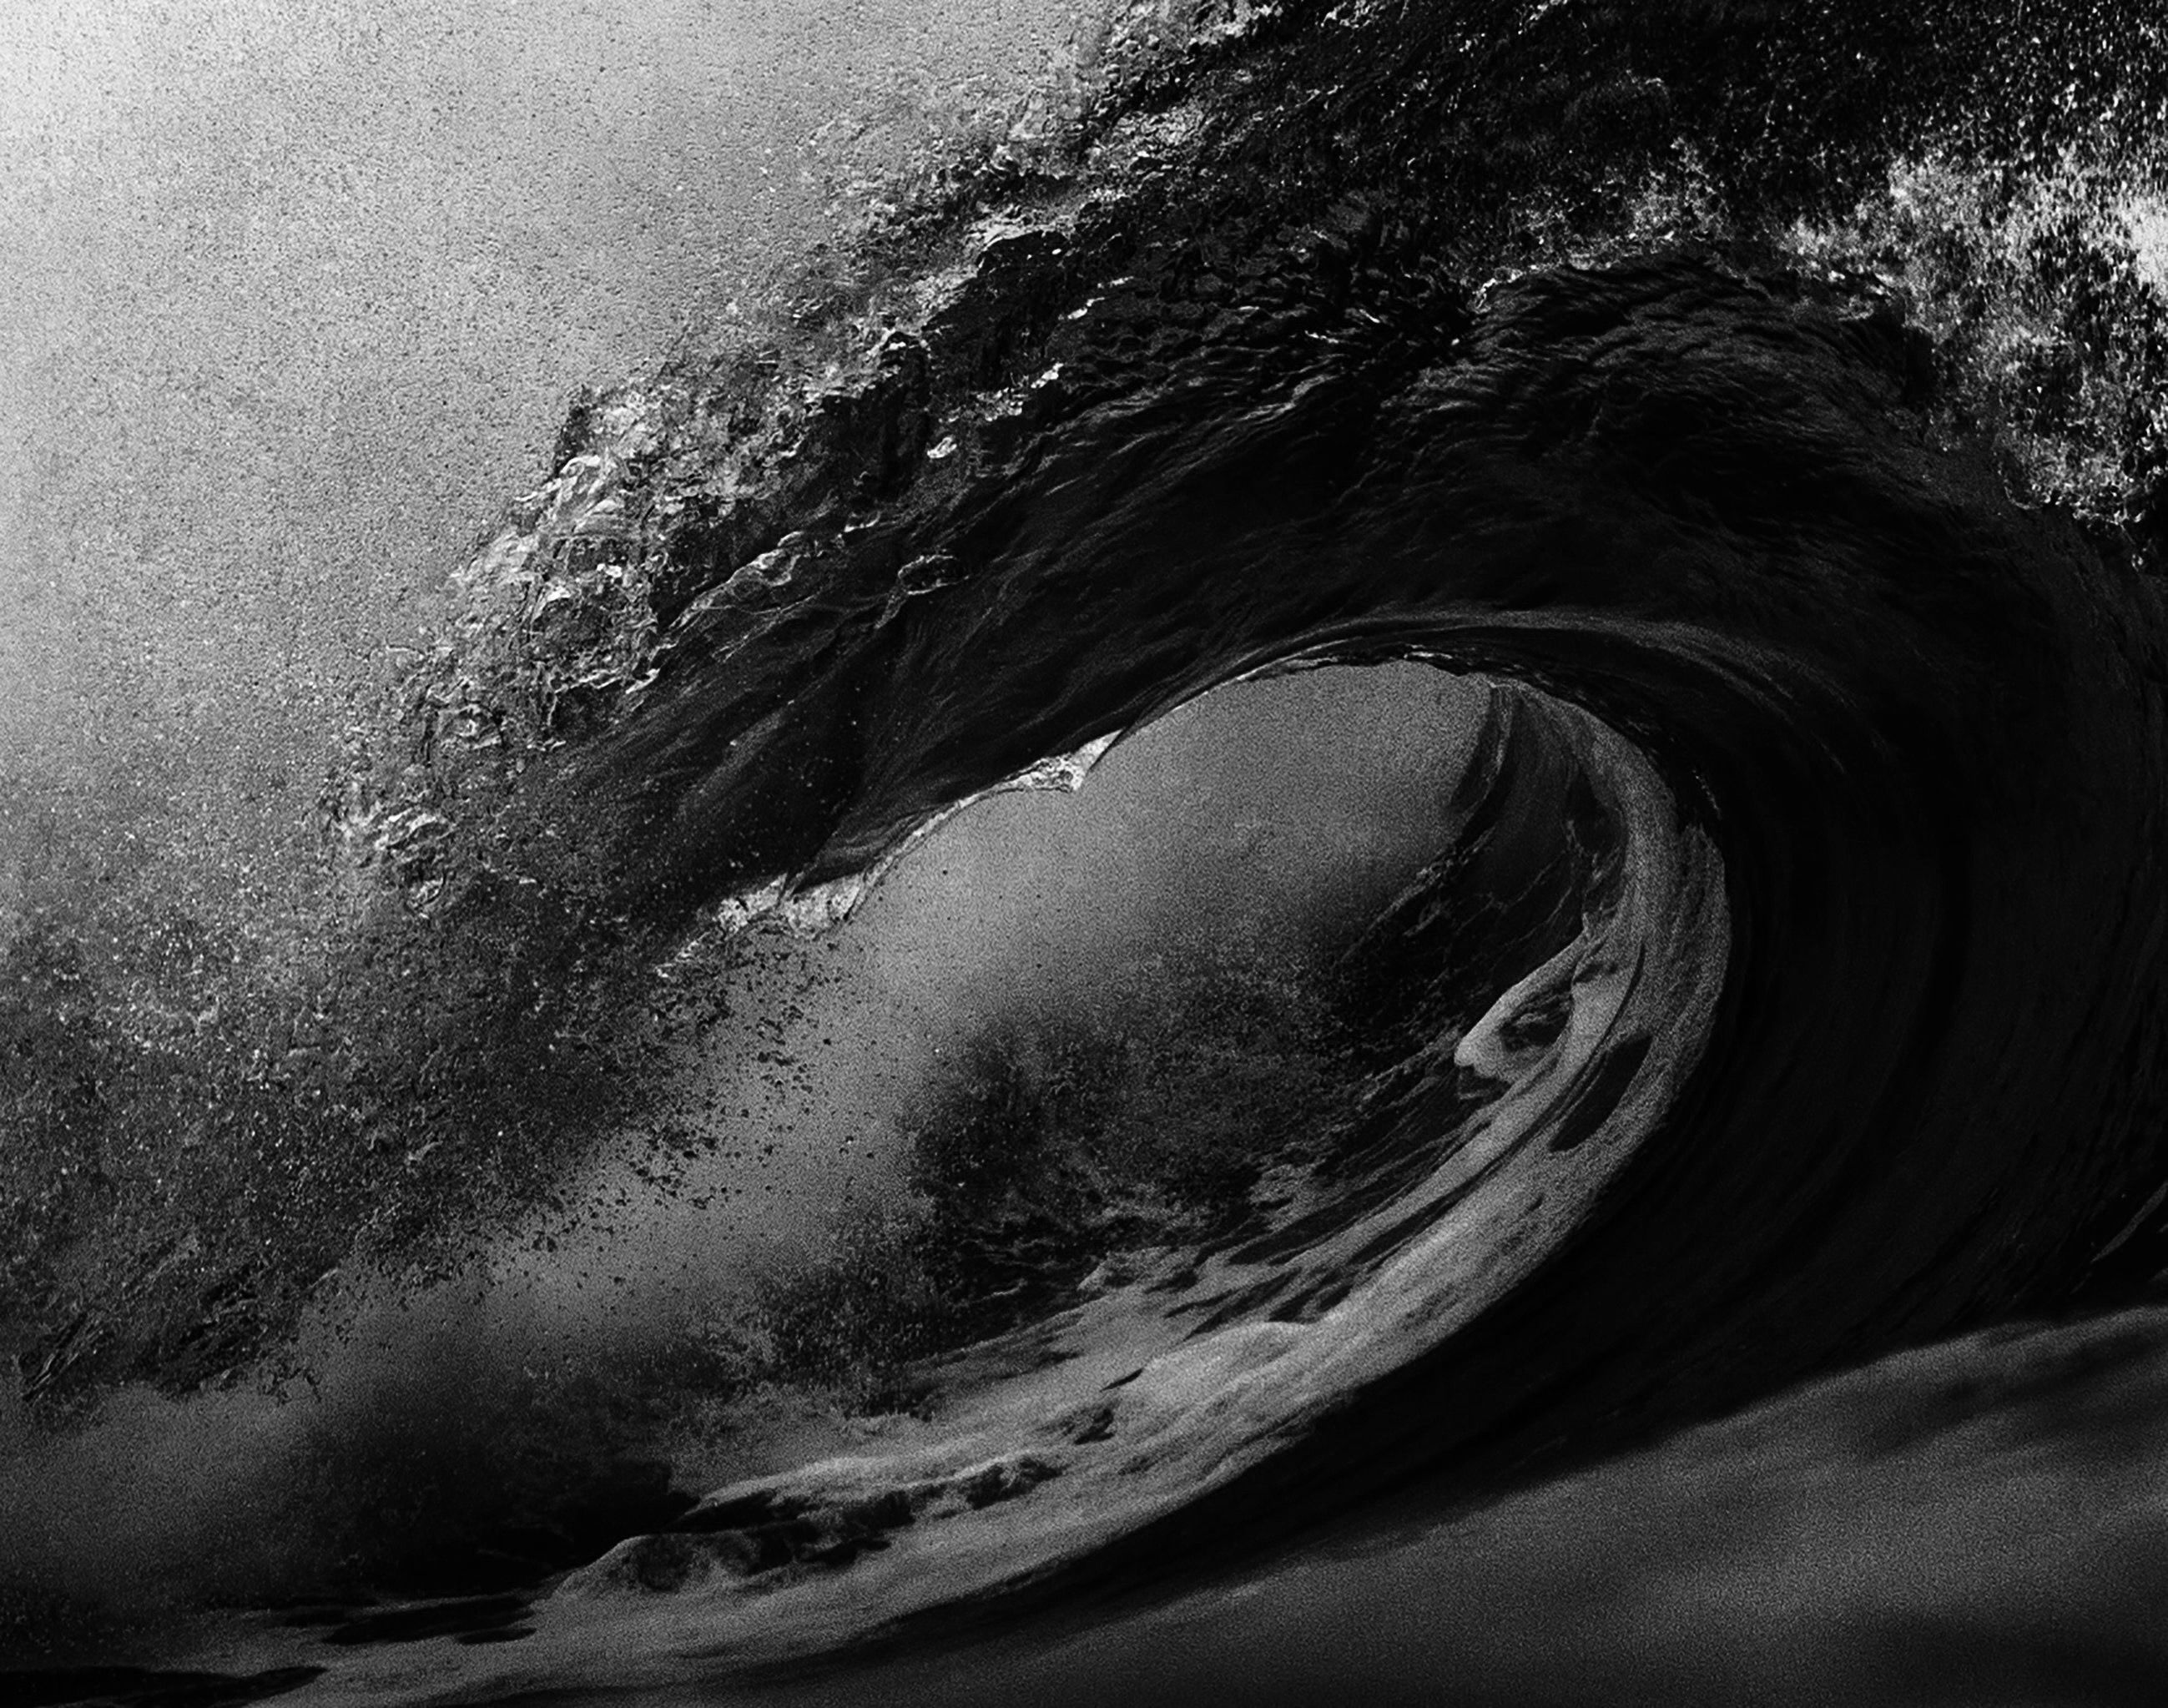 Ultrasounds of the Ocean